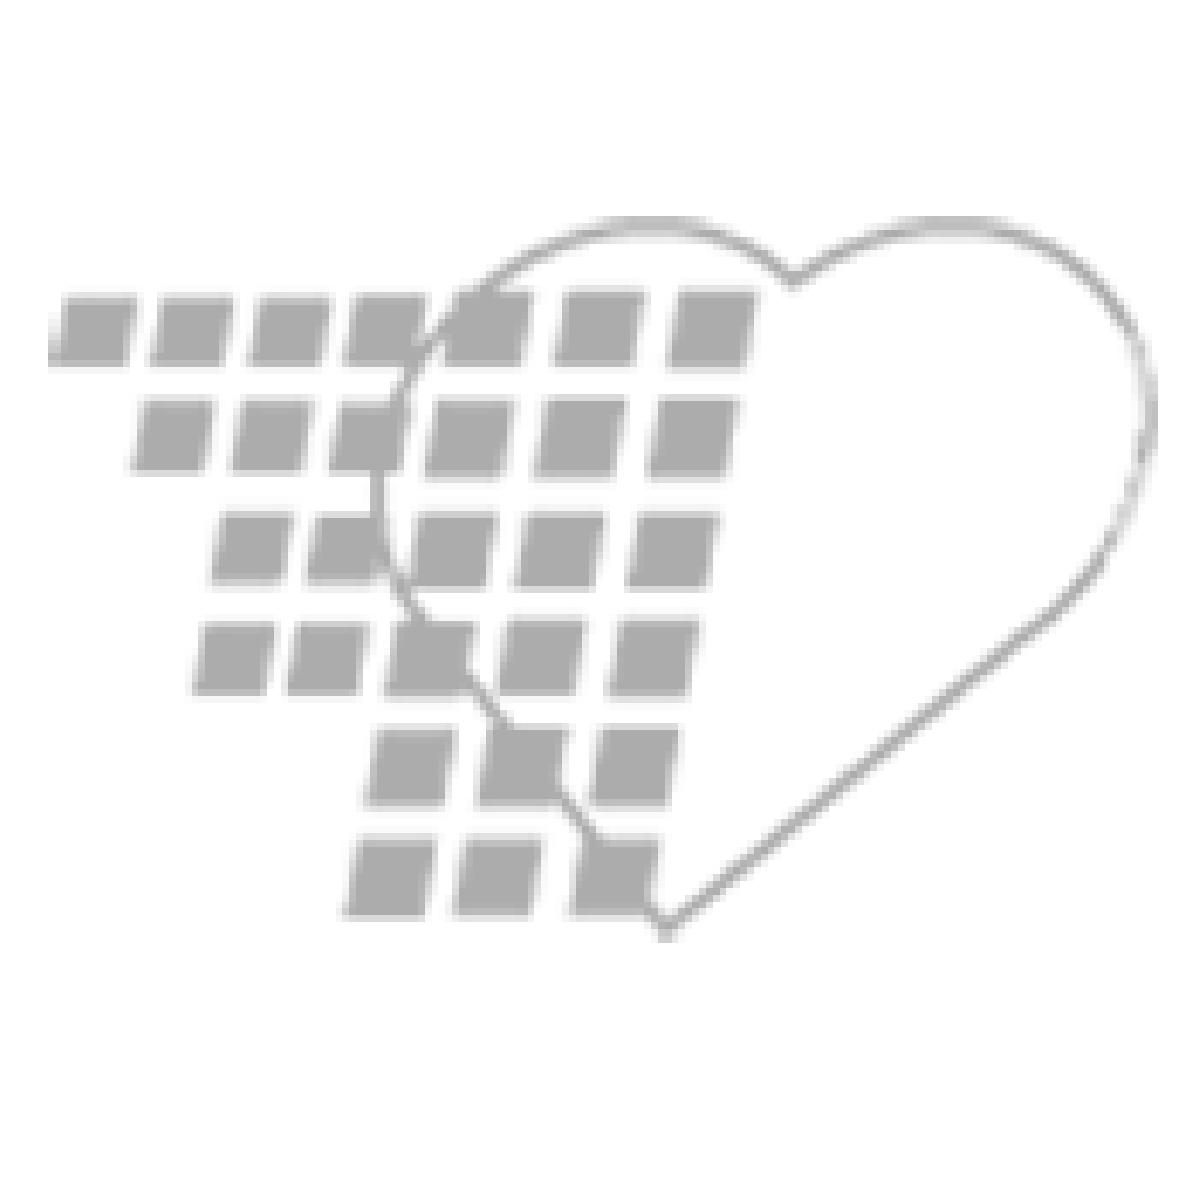 02-49-6604 - Gastroccult® Test Slides